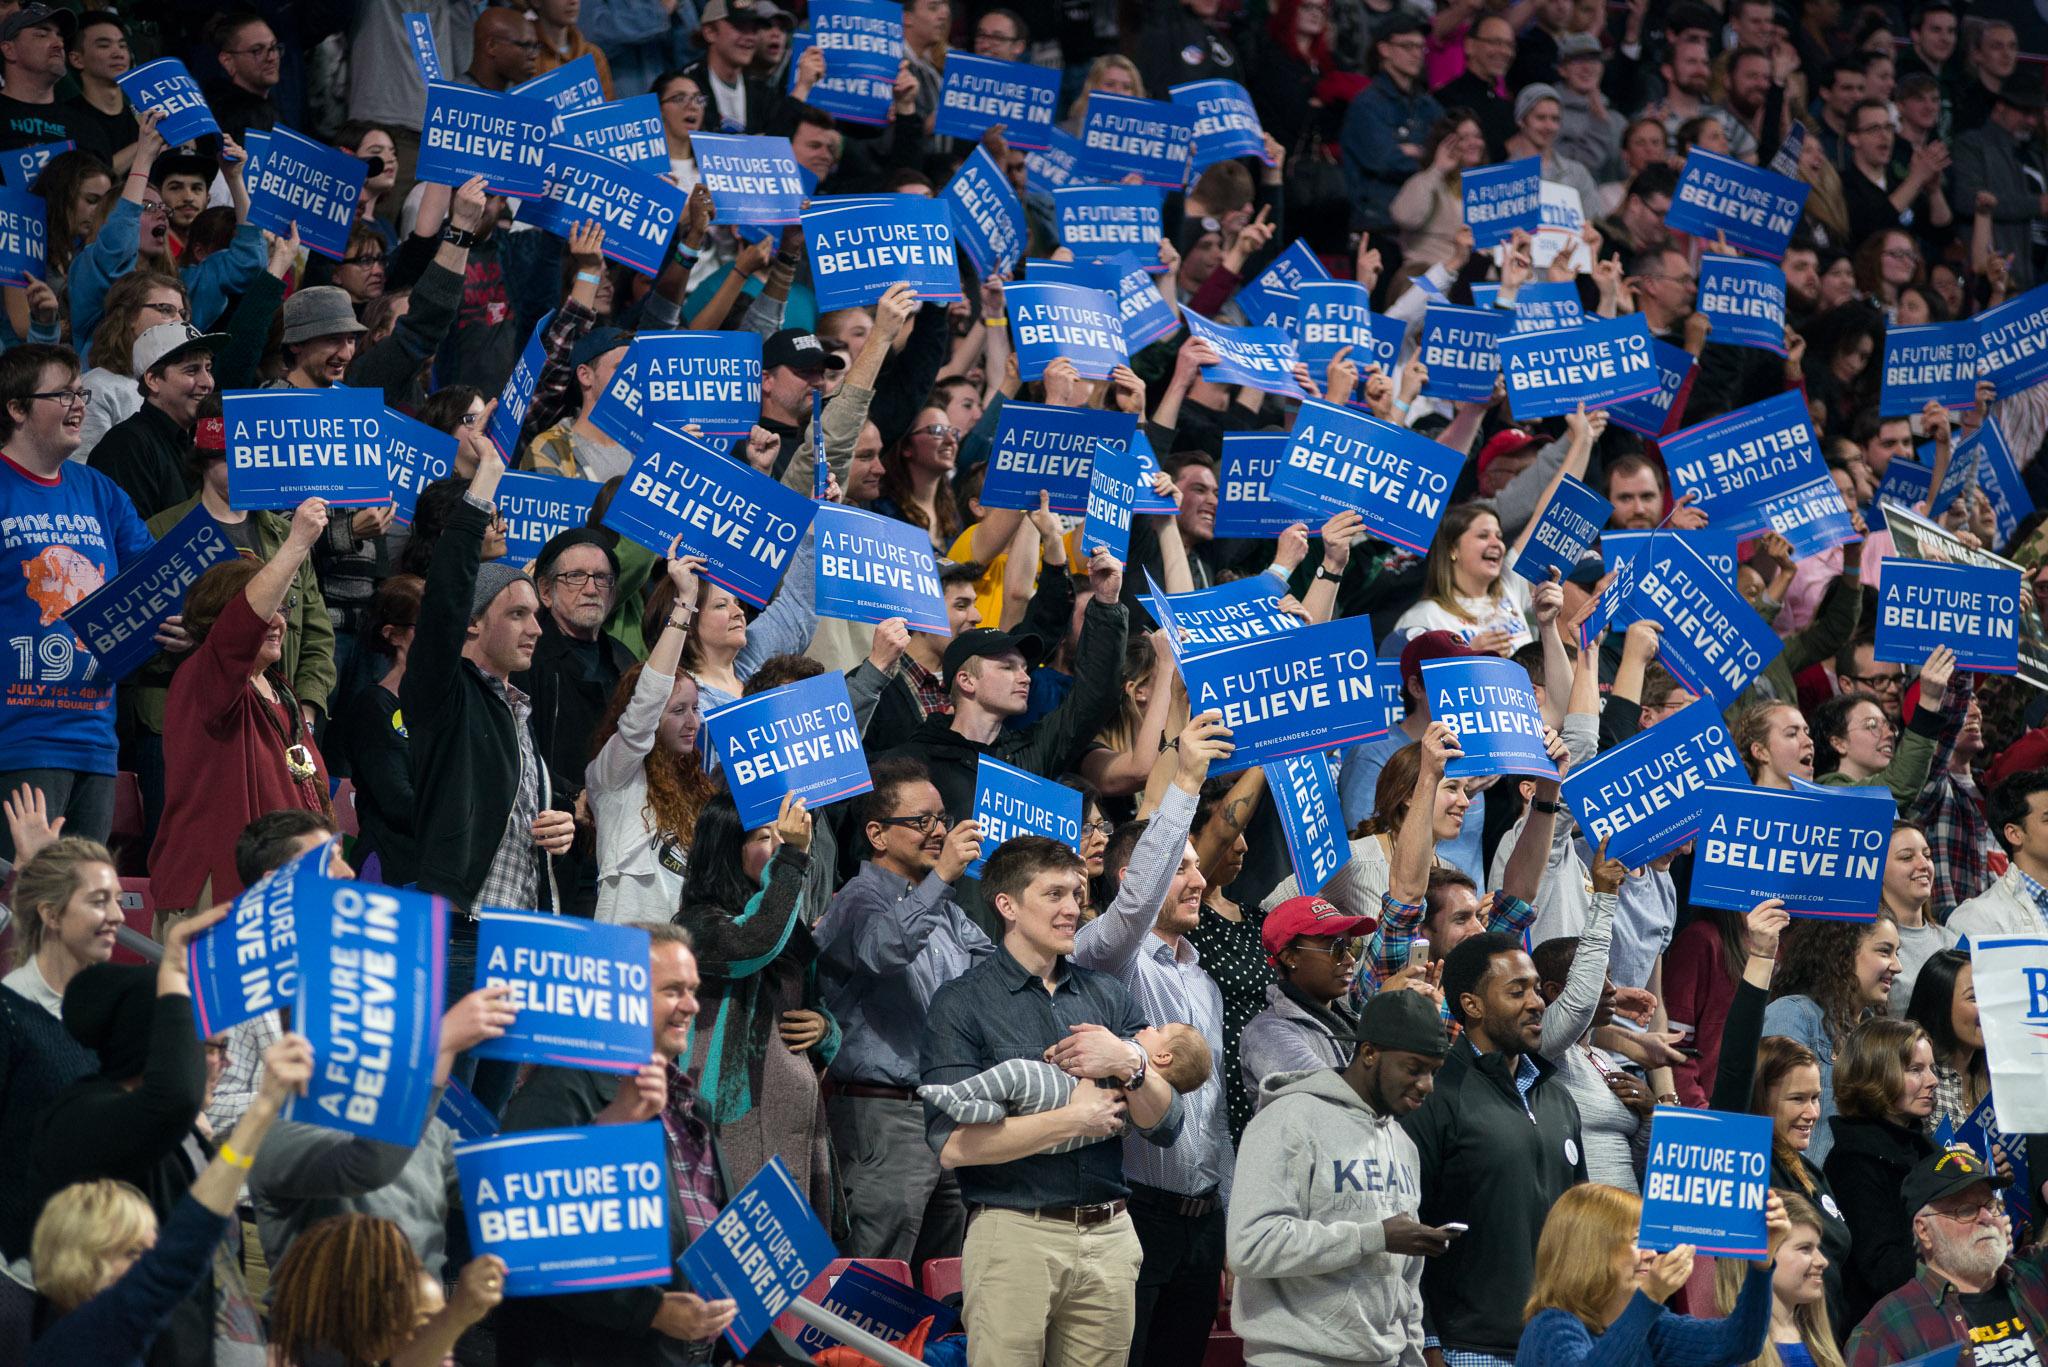 Bernie-Sanders-Philadelphia-Jeremy-Jeziorski-2016-04-06-web-16.jpg